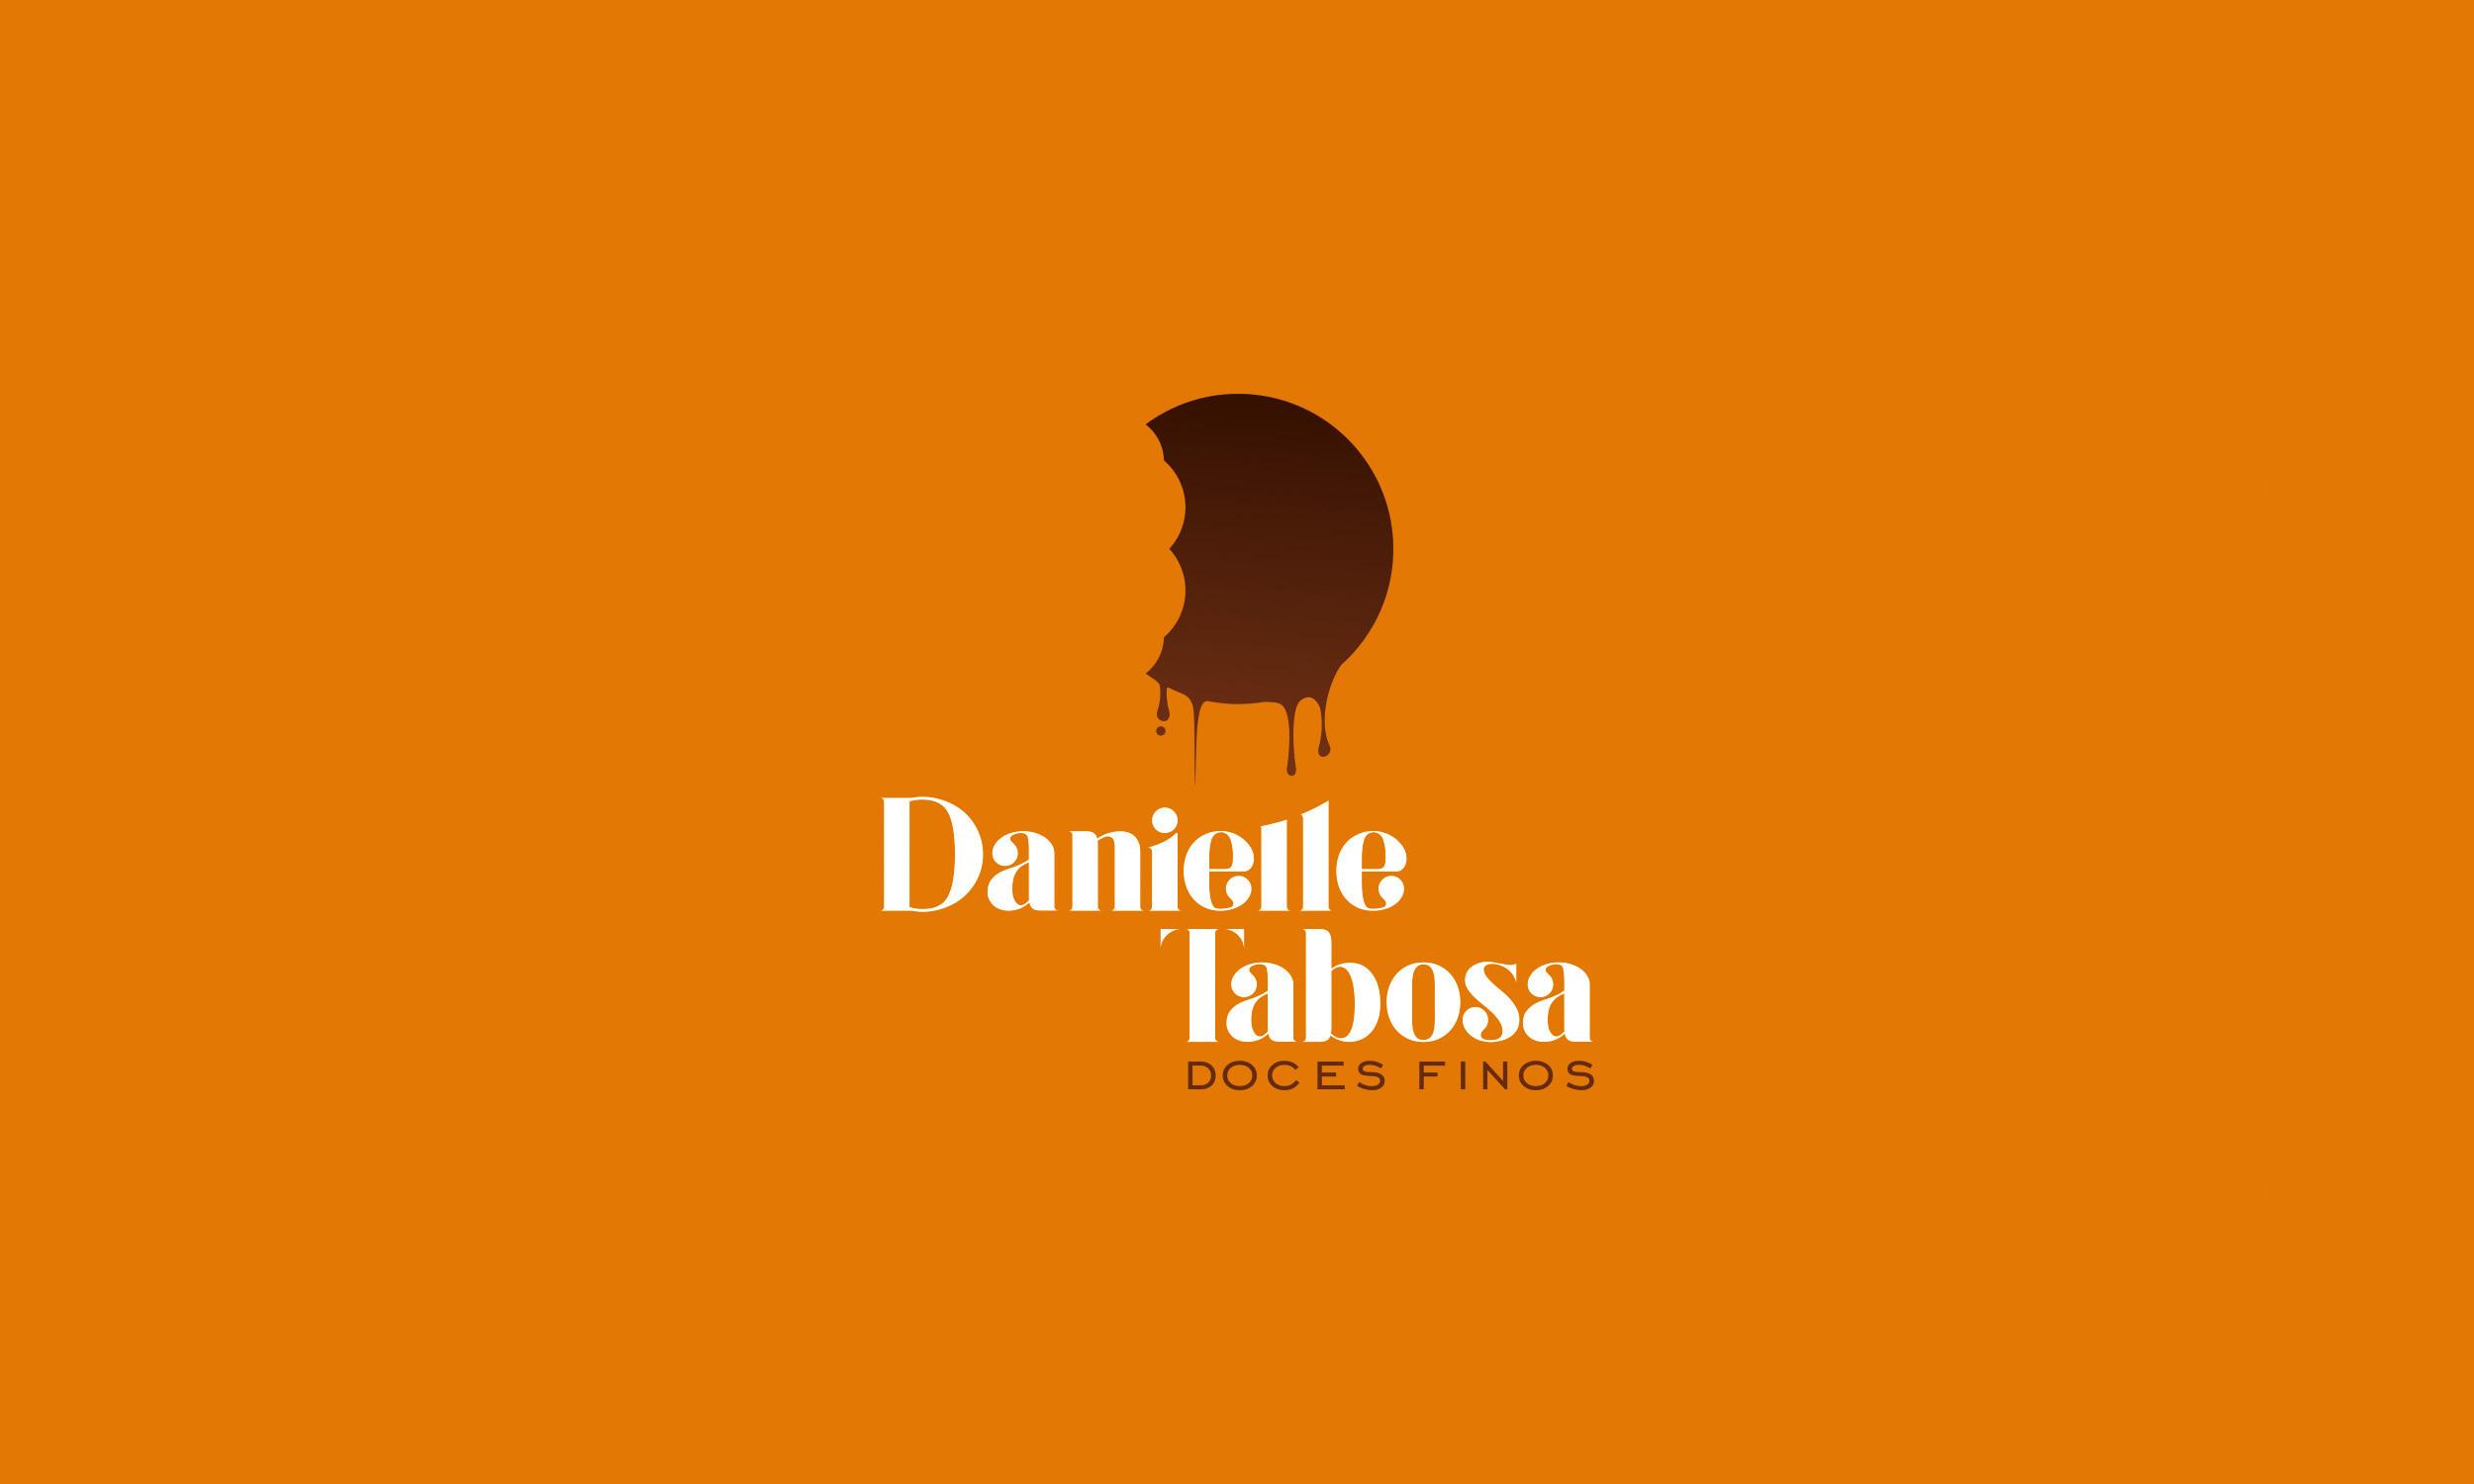 Danielle Tabosa